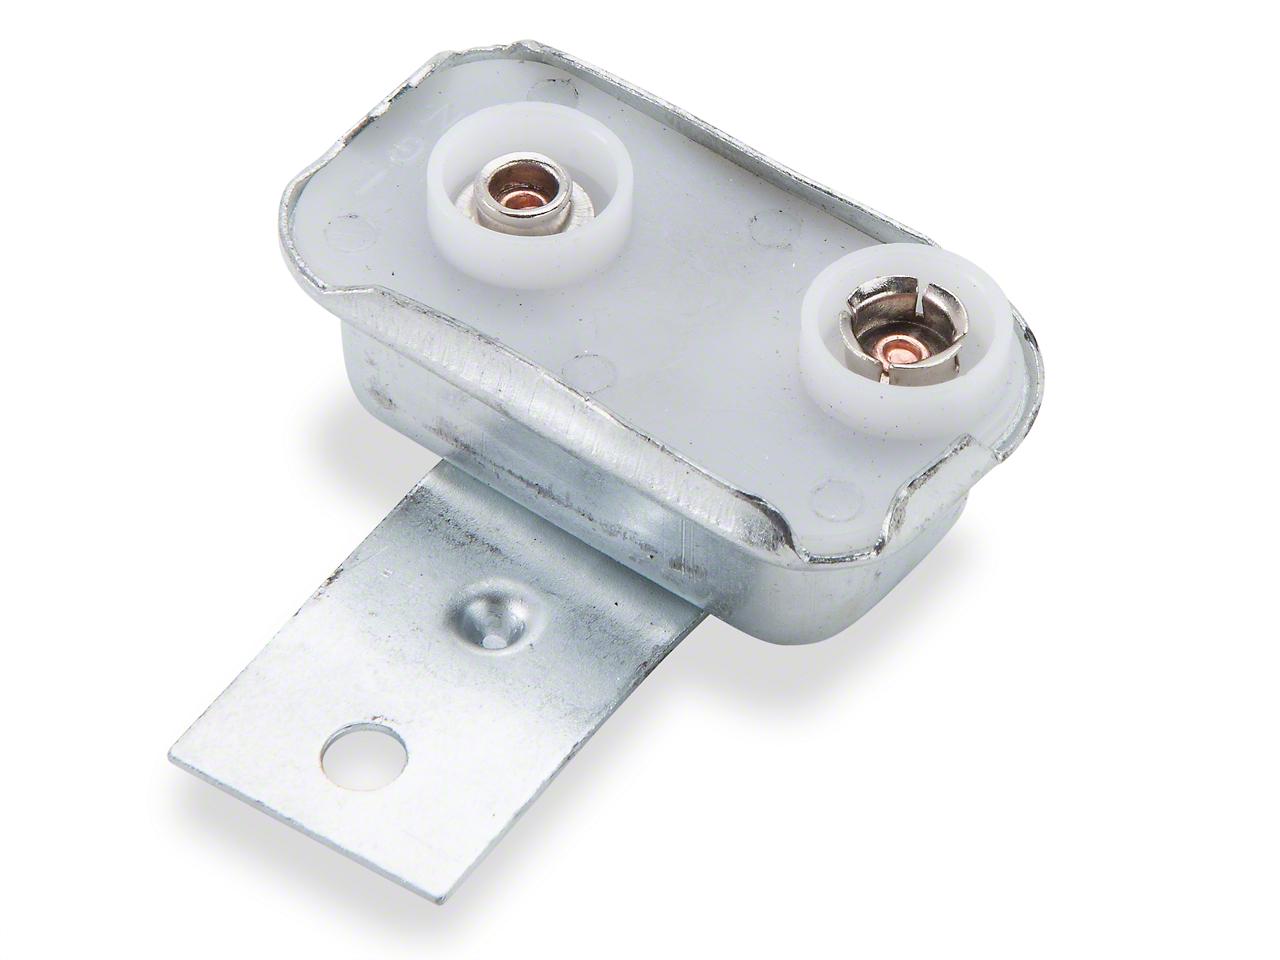 Instrument Panel Voltage Regulator (79-86 All)